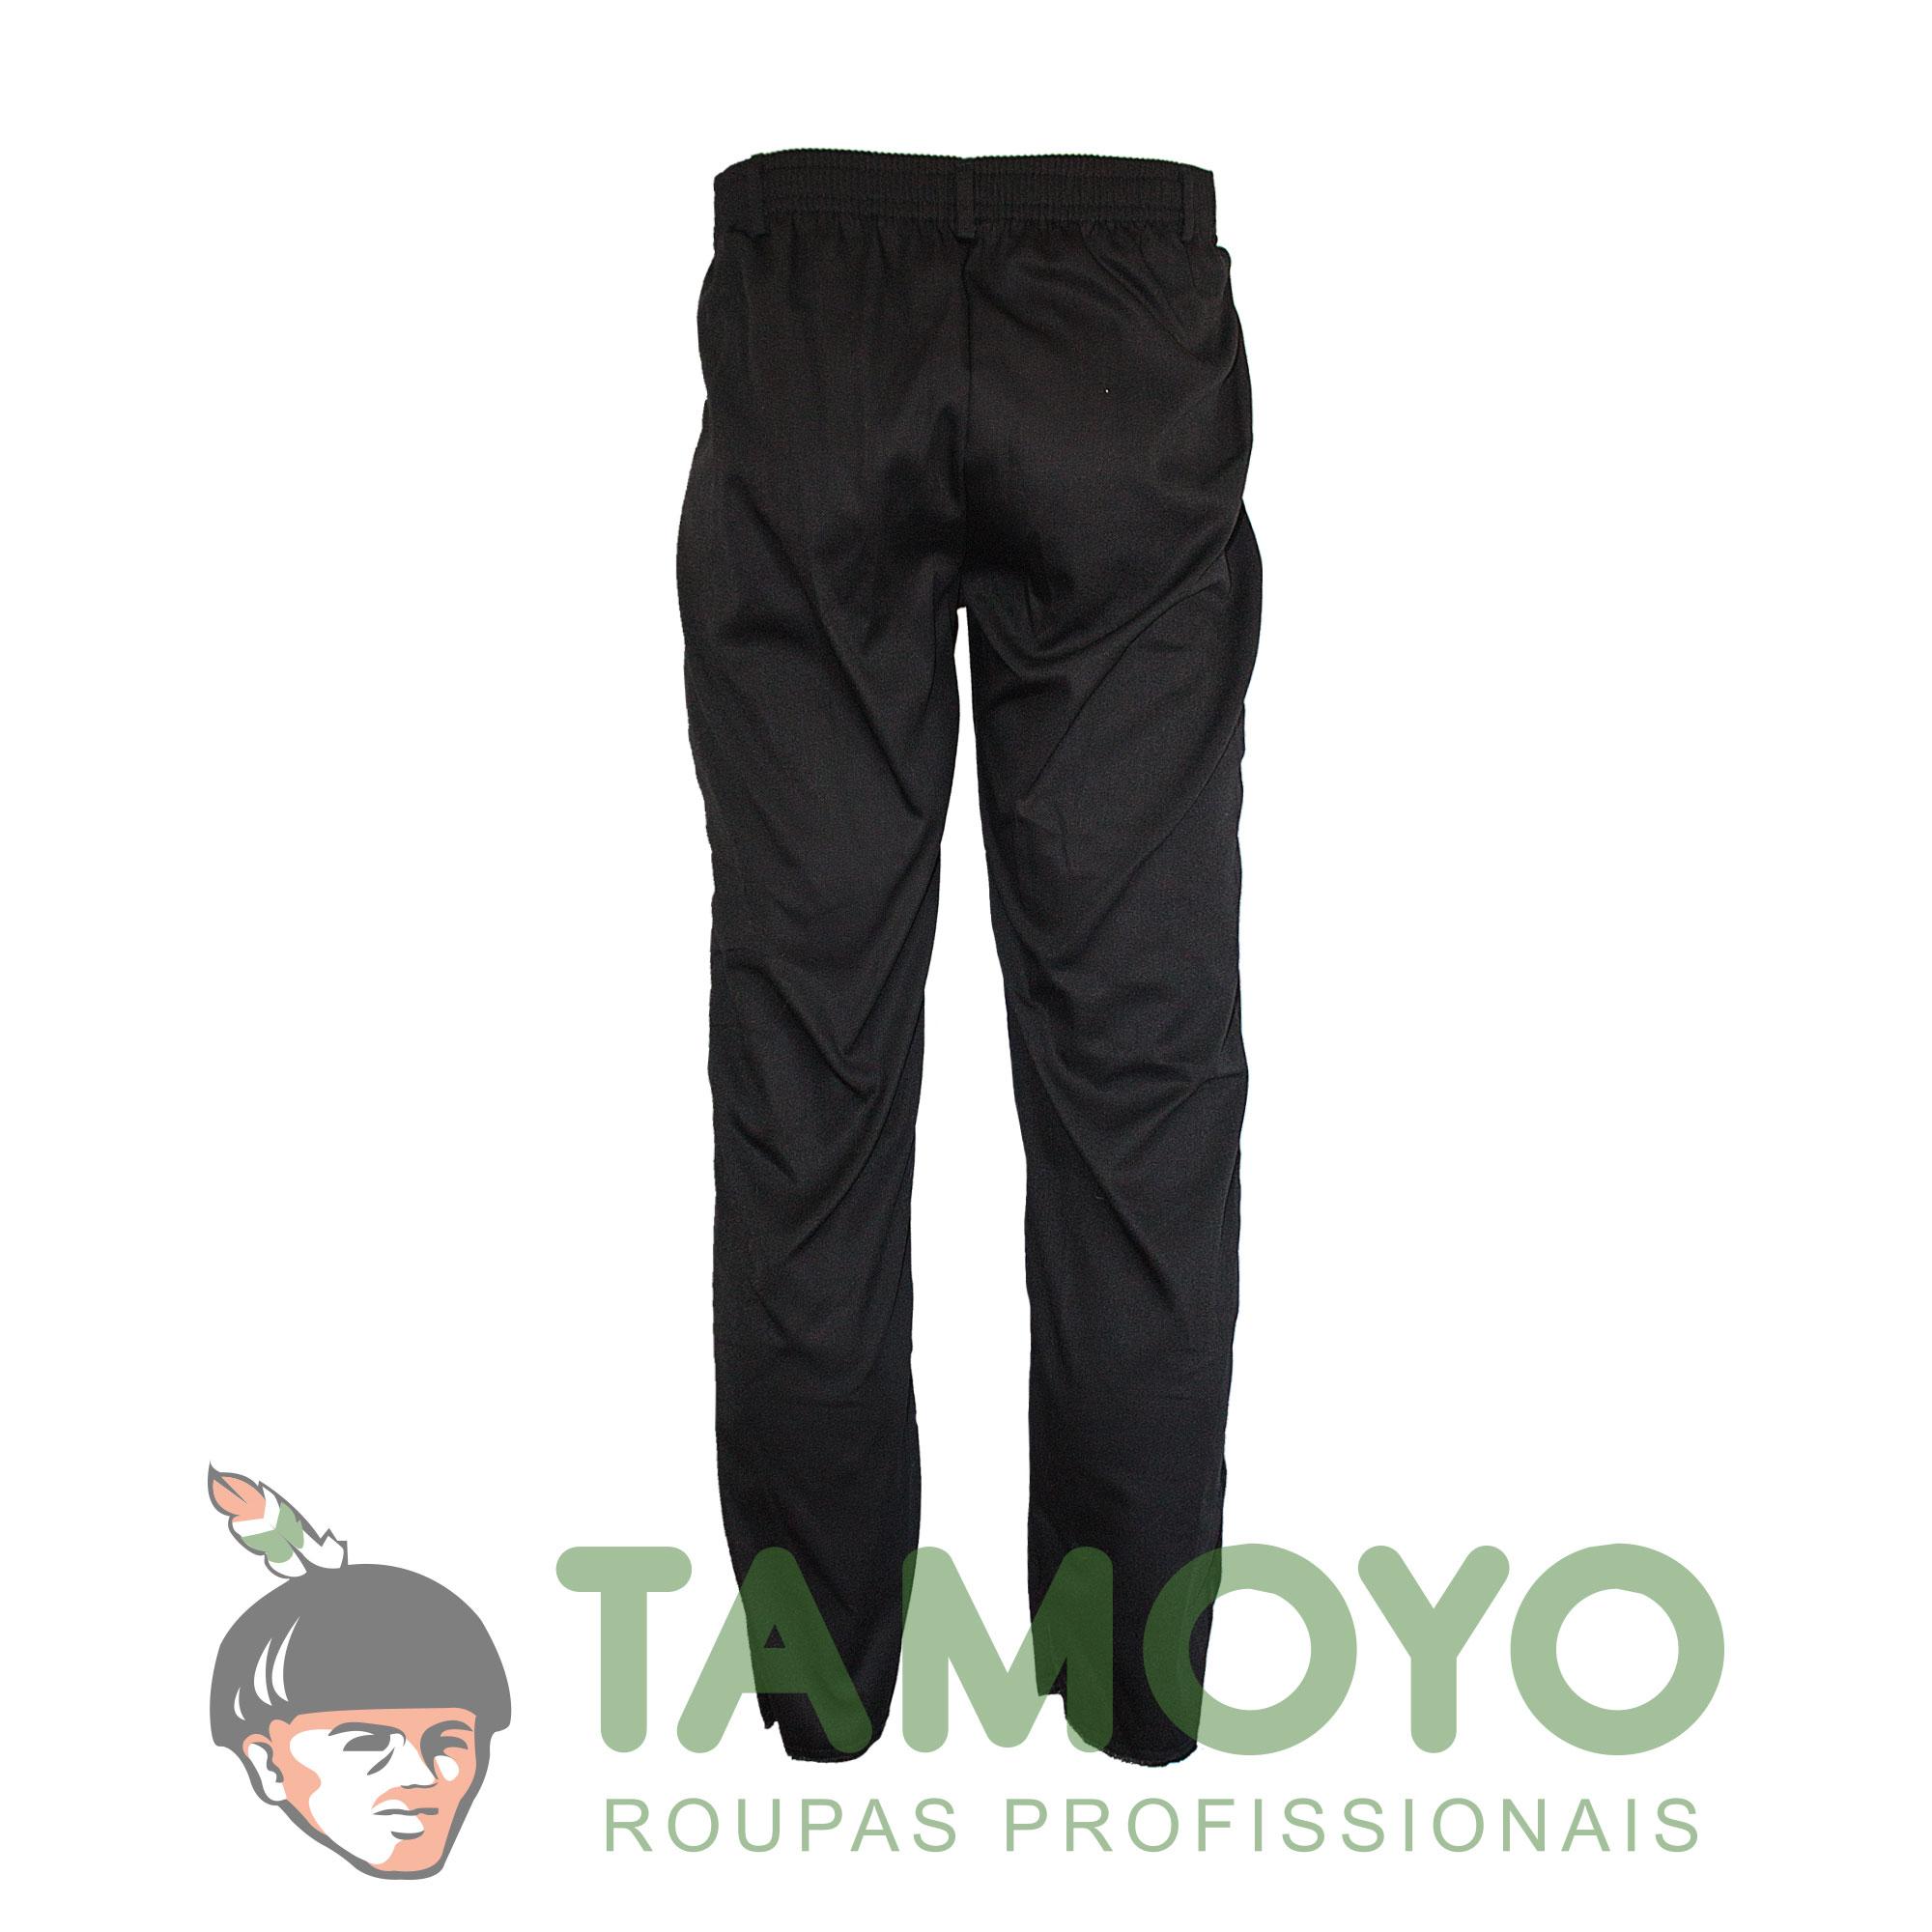 calca-atendente-feminino-roupas-tamoyo-uniformes-profissionais-c